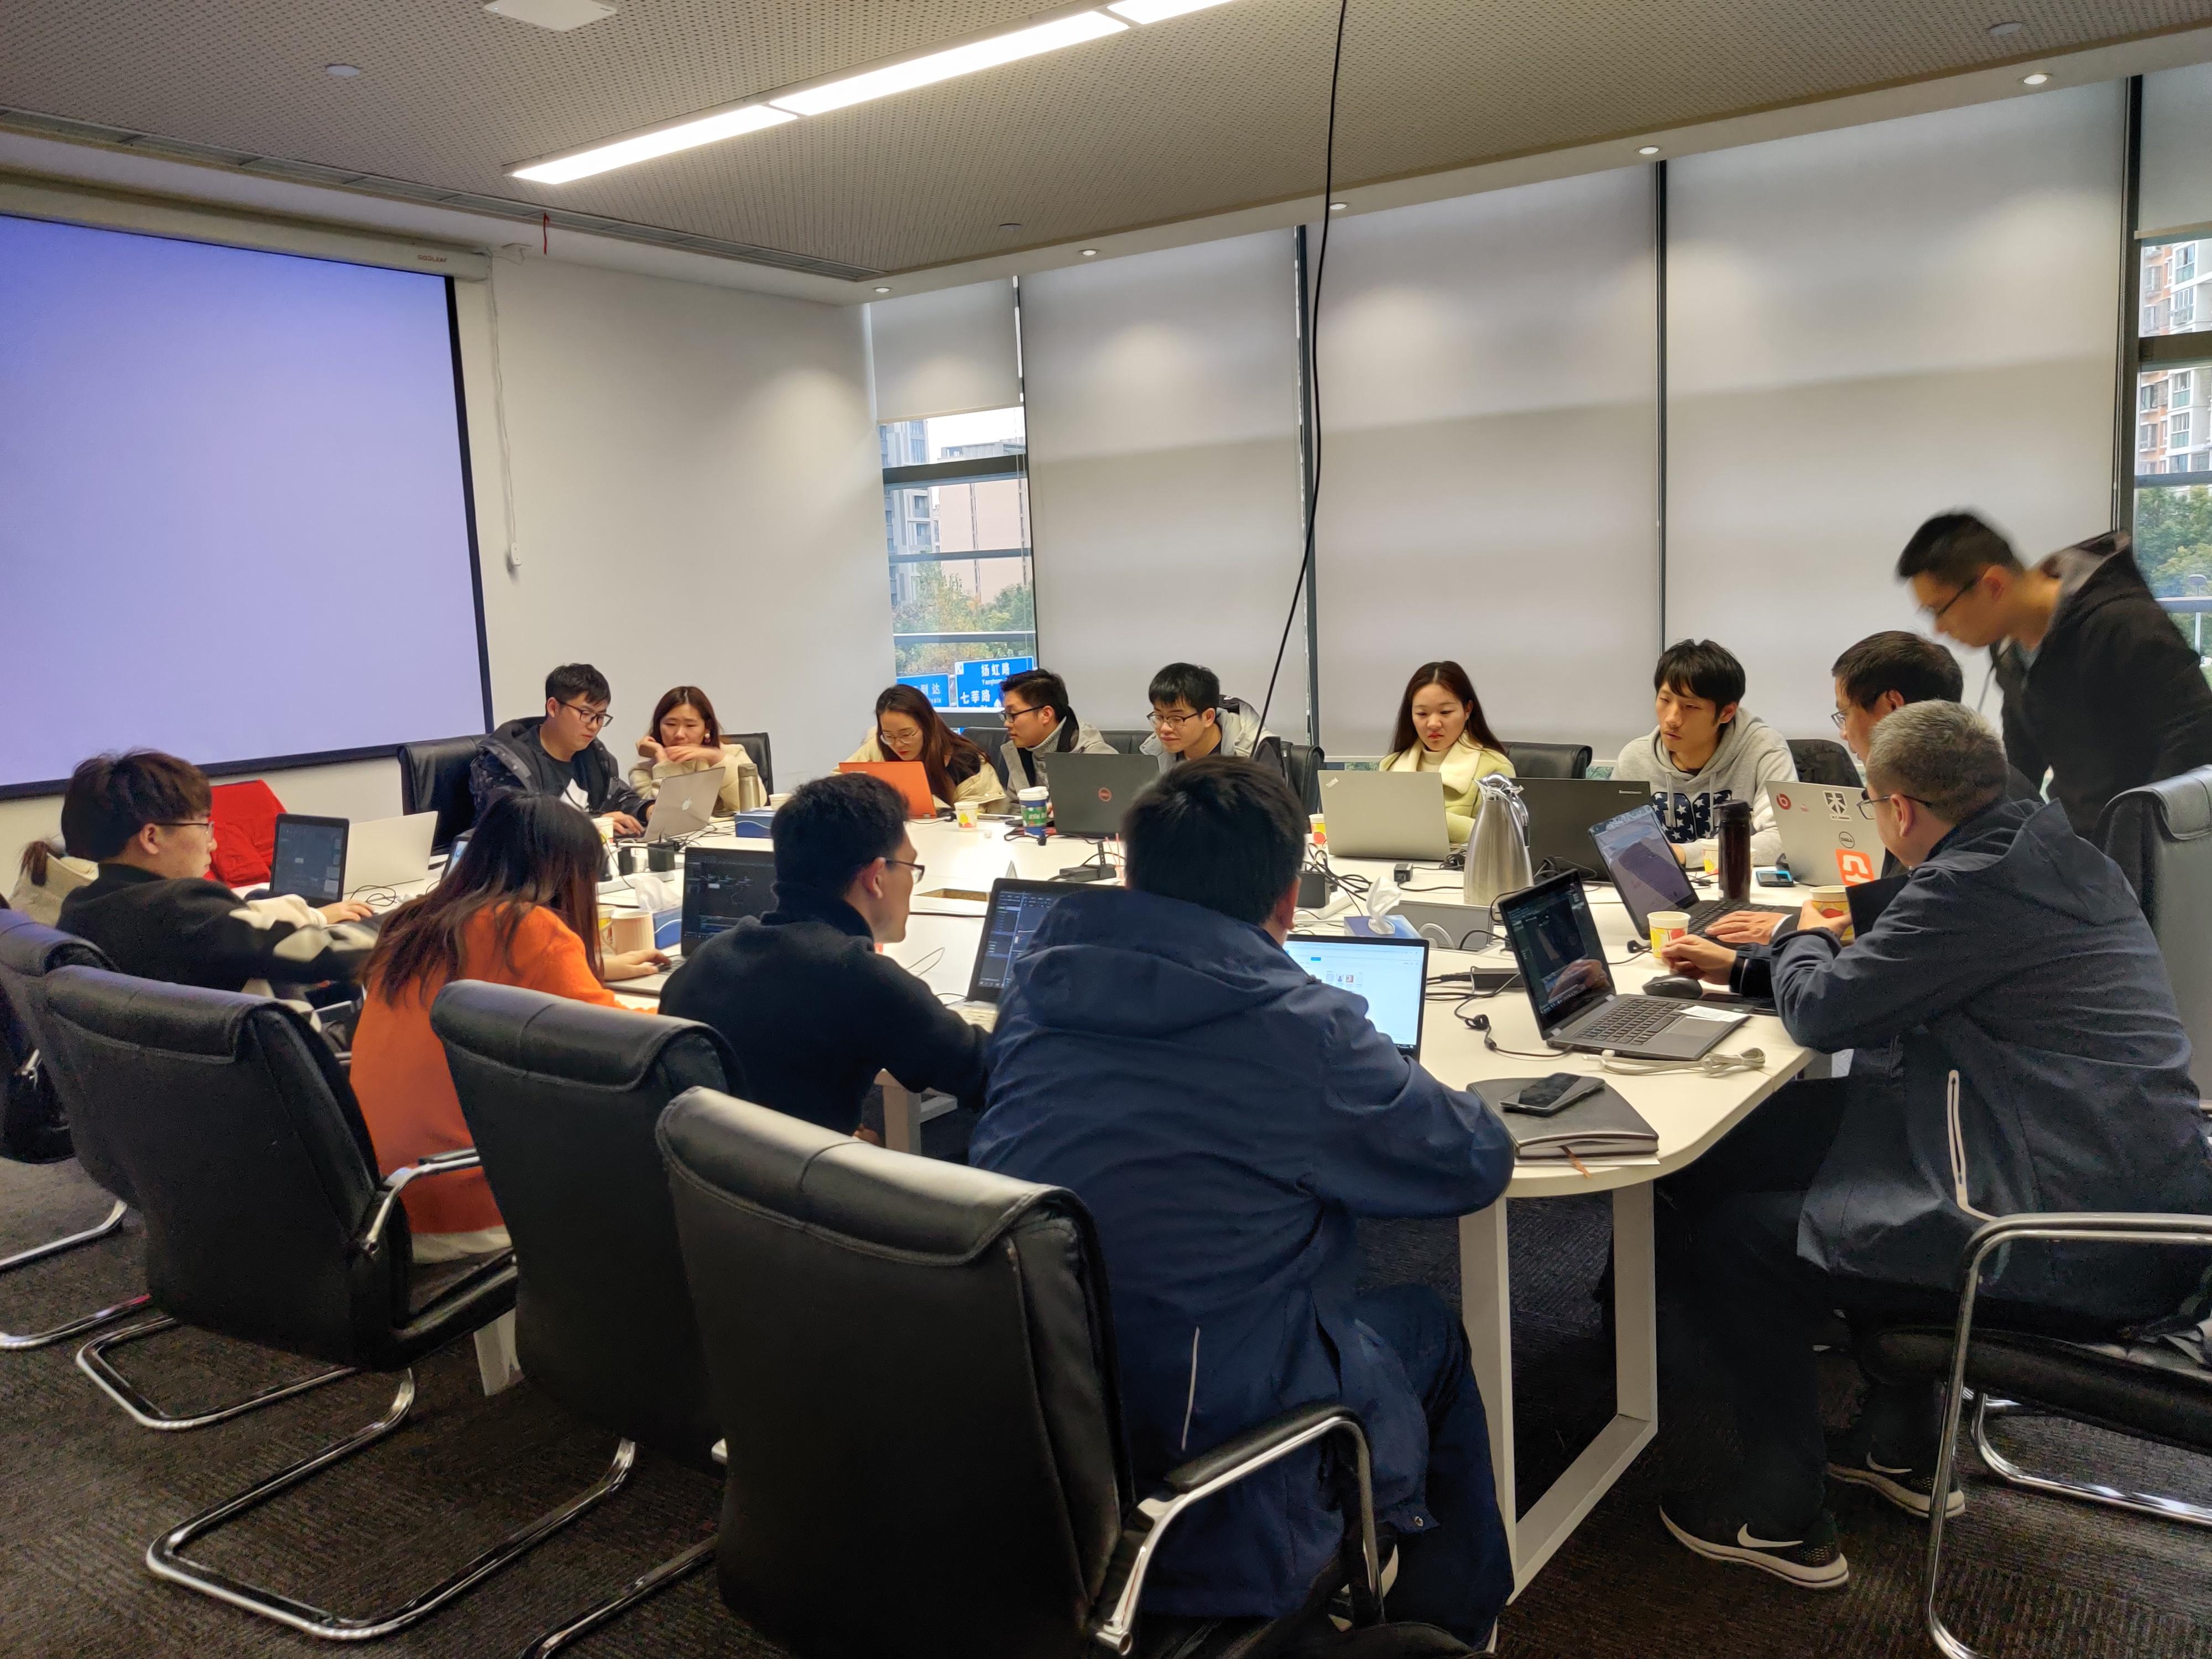 iS-RPA 技术认证培训 上海 20191219 班